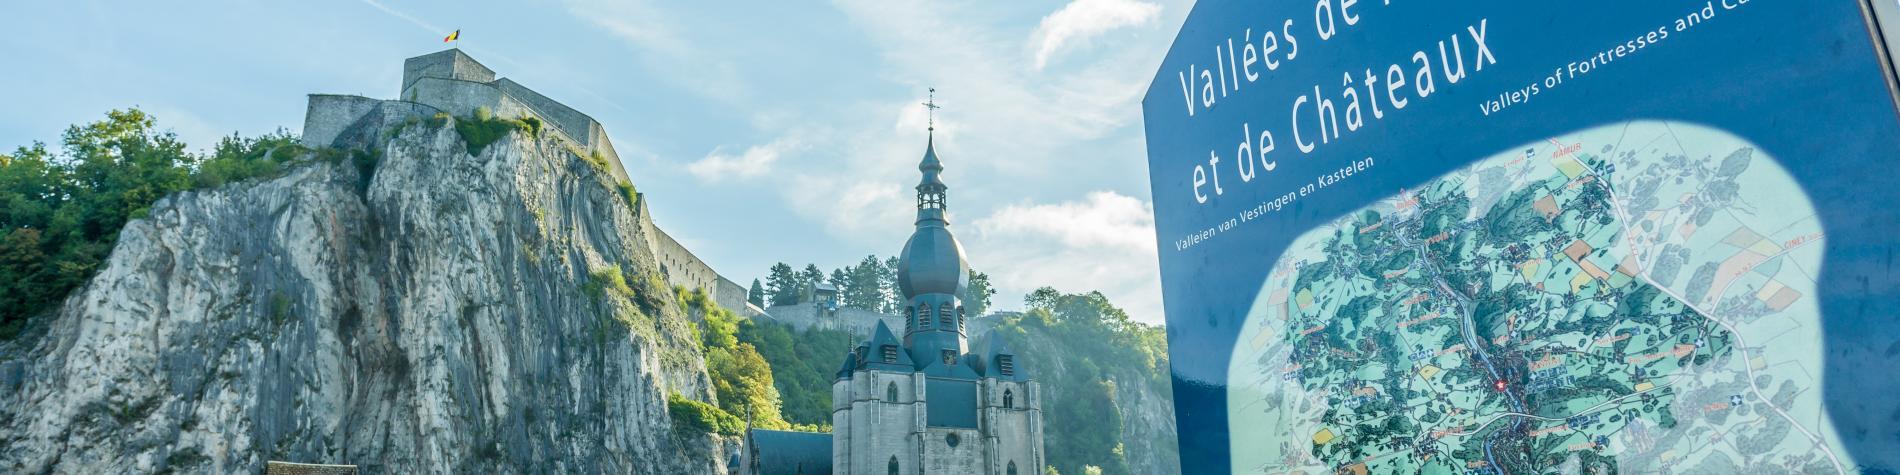 Dinant - carte - chemin - forteresse - châteaux